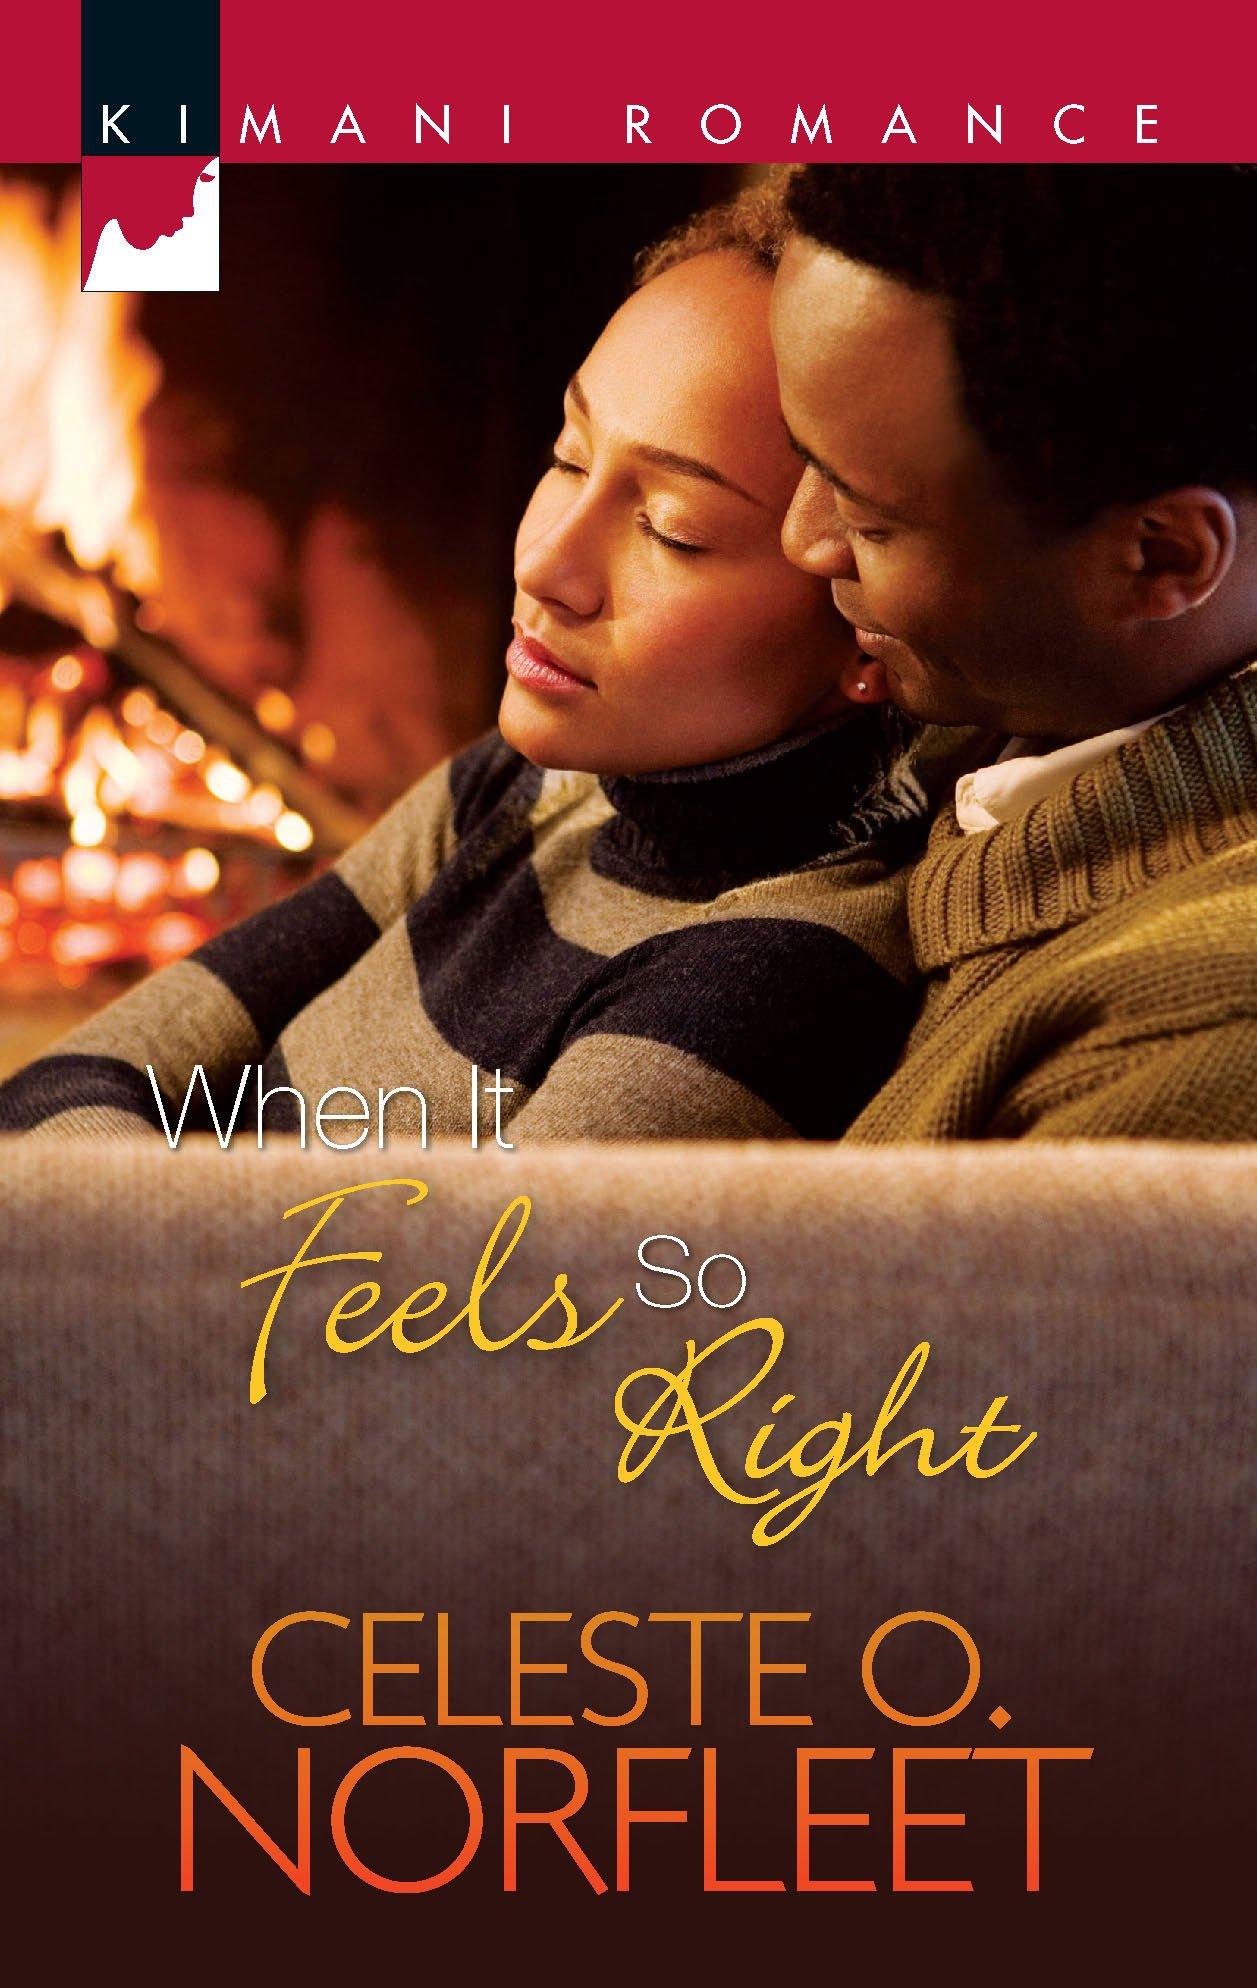 Amazon.com: When It Feels So Right (Kimani Romance) (9780373861316):  Celeste O. Norfleet: Books